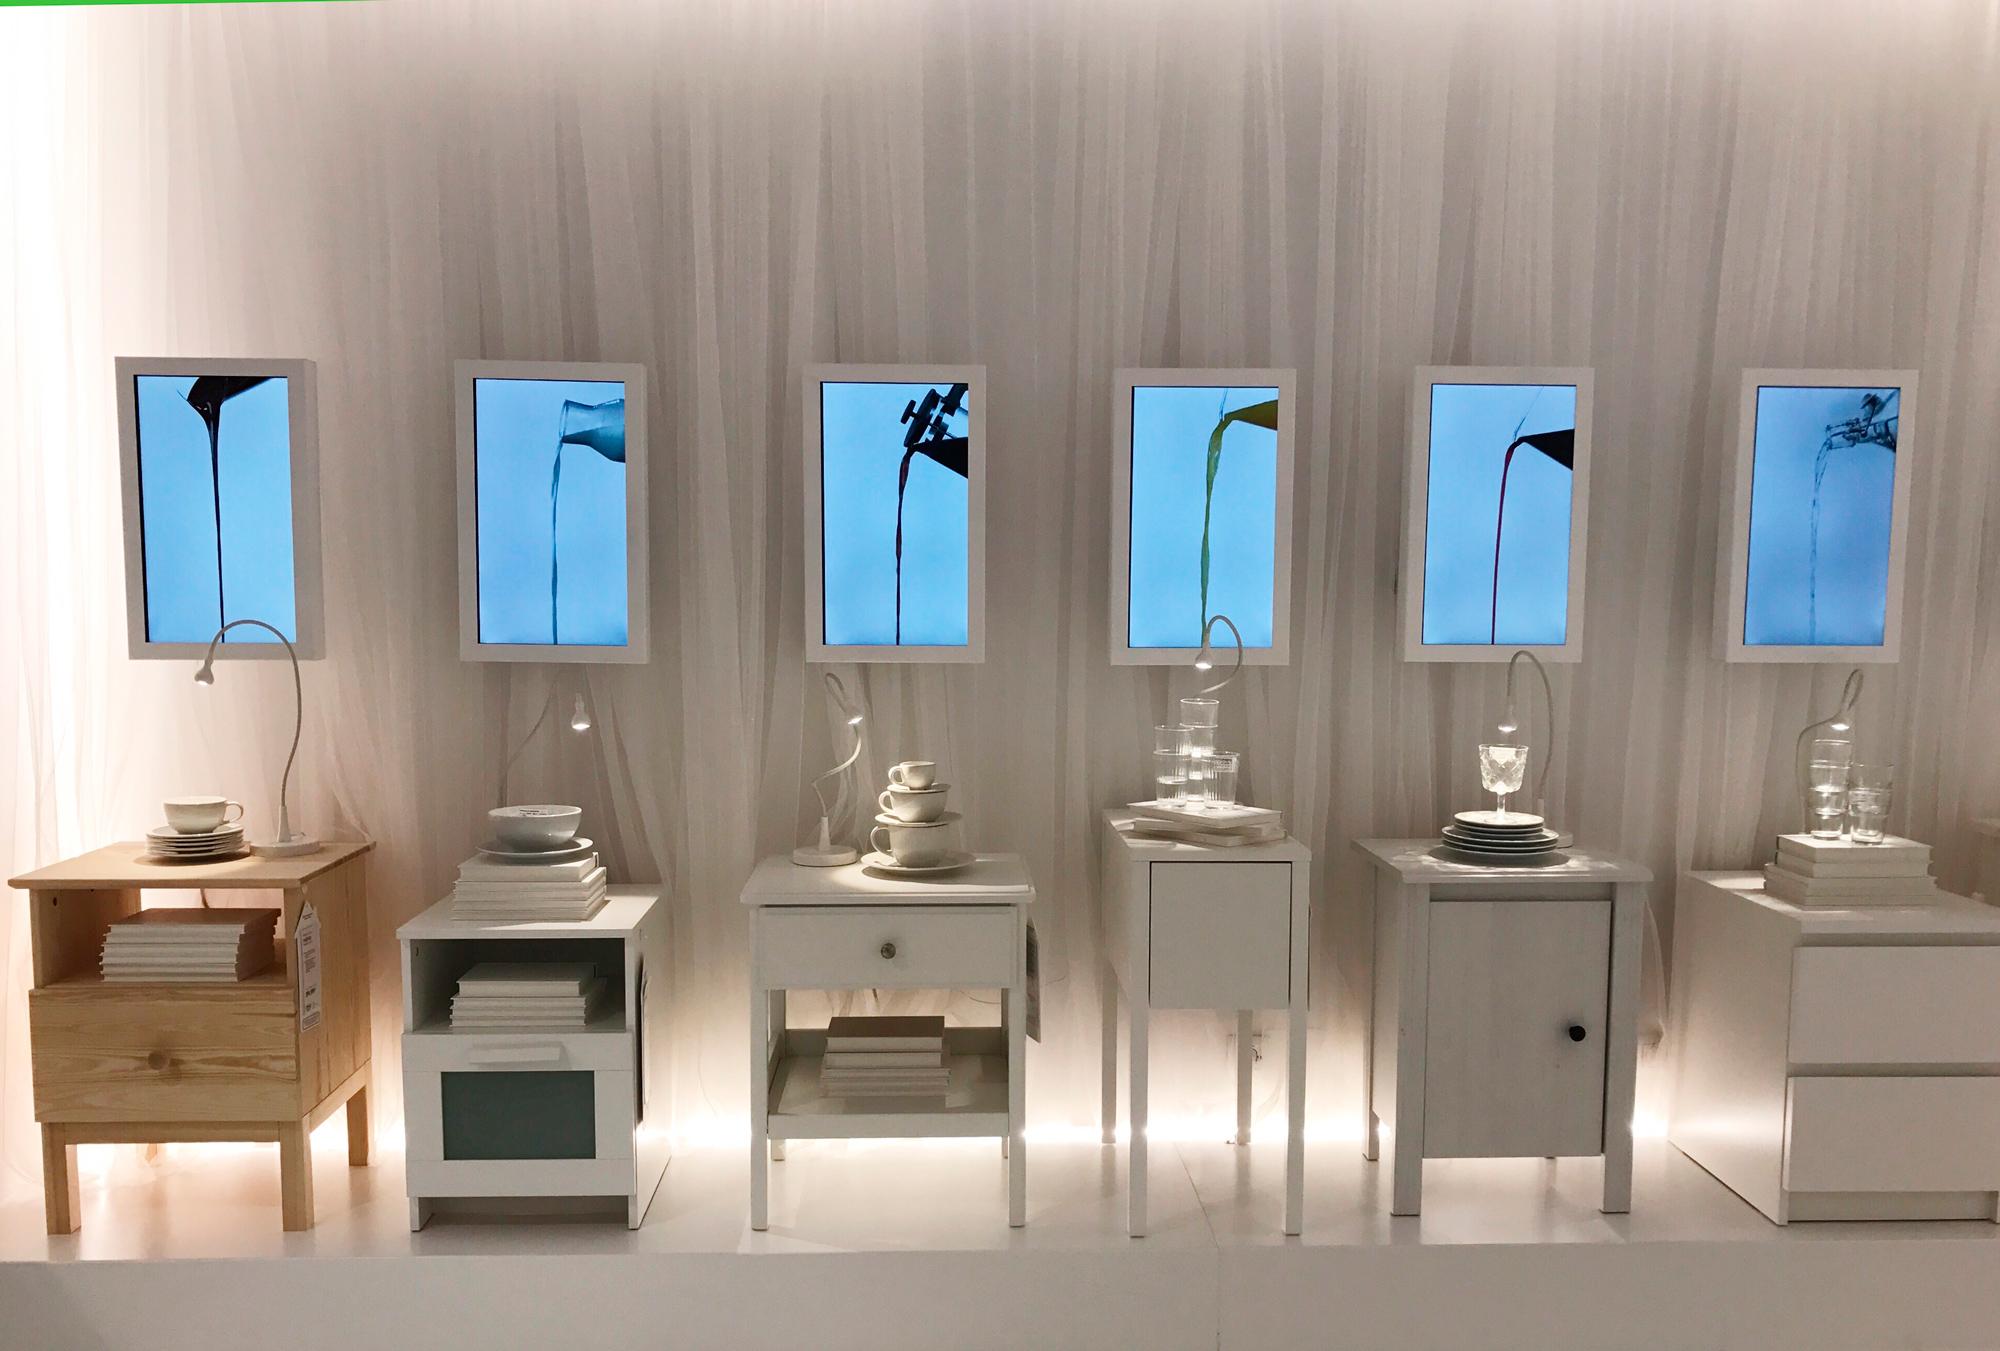 ikea in madrid finest full size of ikea ikea desk assembly hostgarcia commode schuhbank ikea. Black Bedroom Furniture Sets. Home Design Ideas